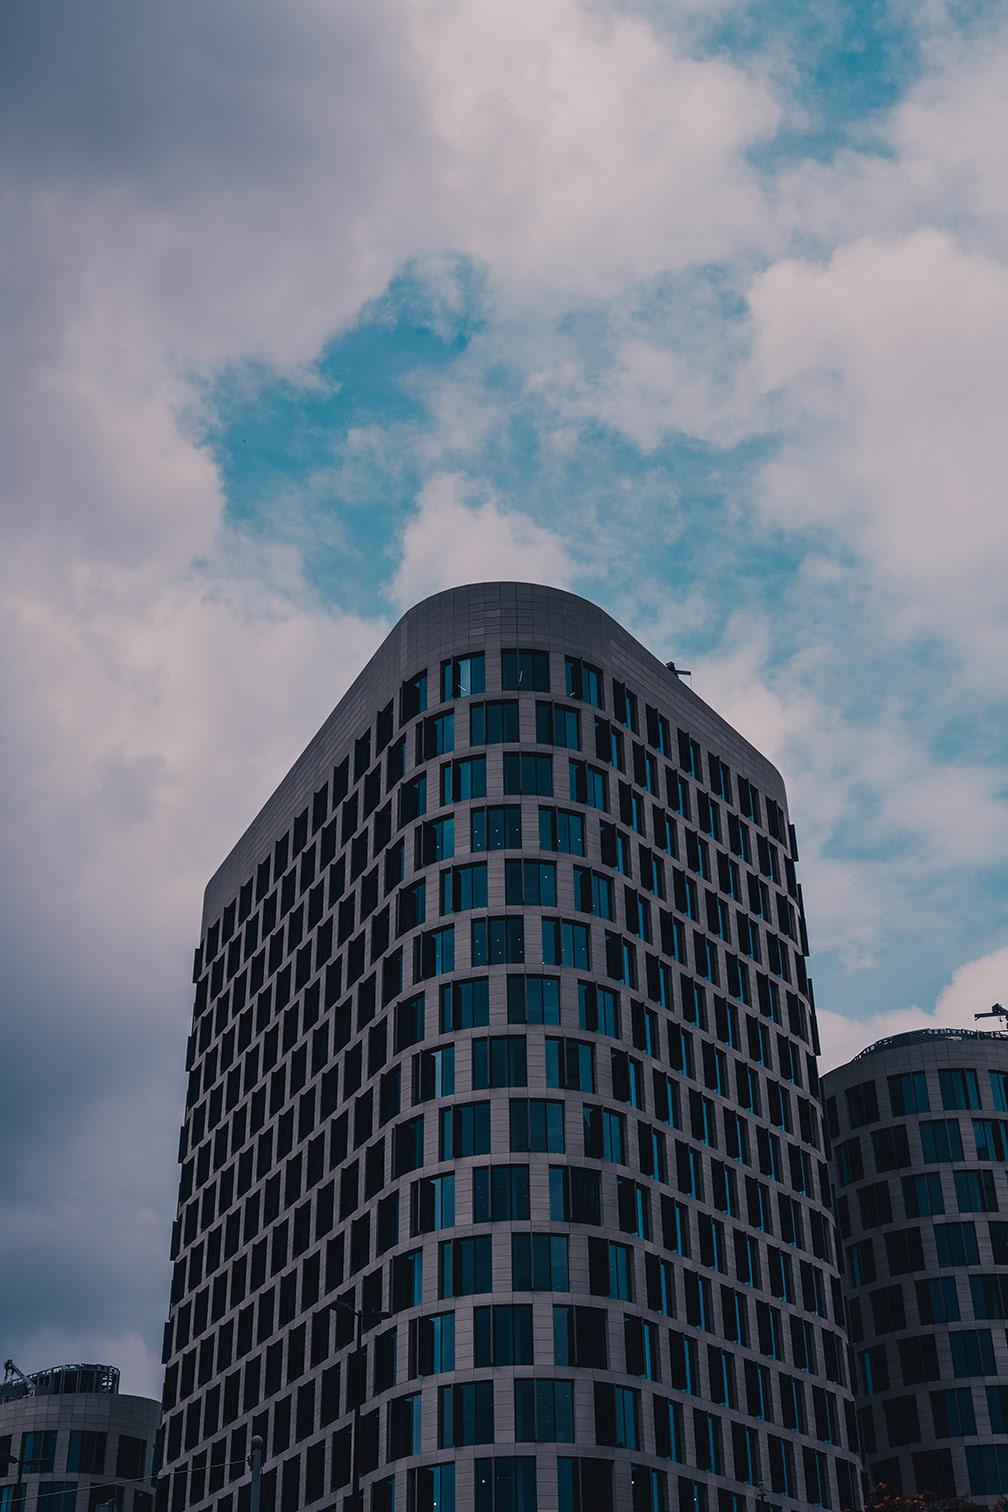 brussel architecture